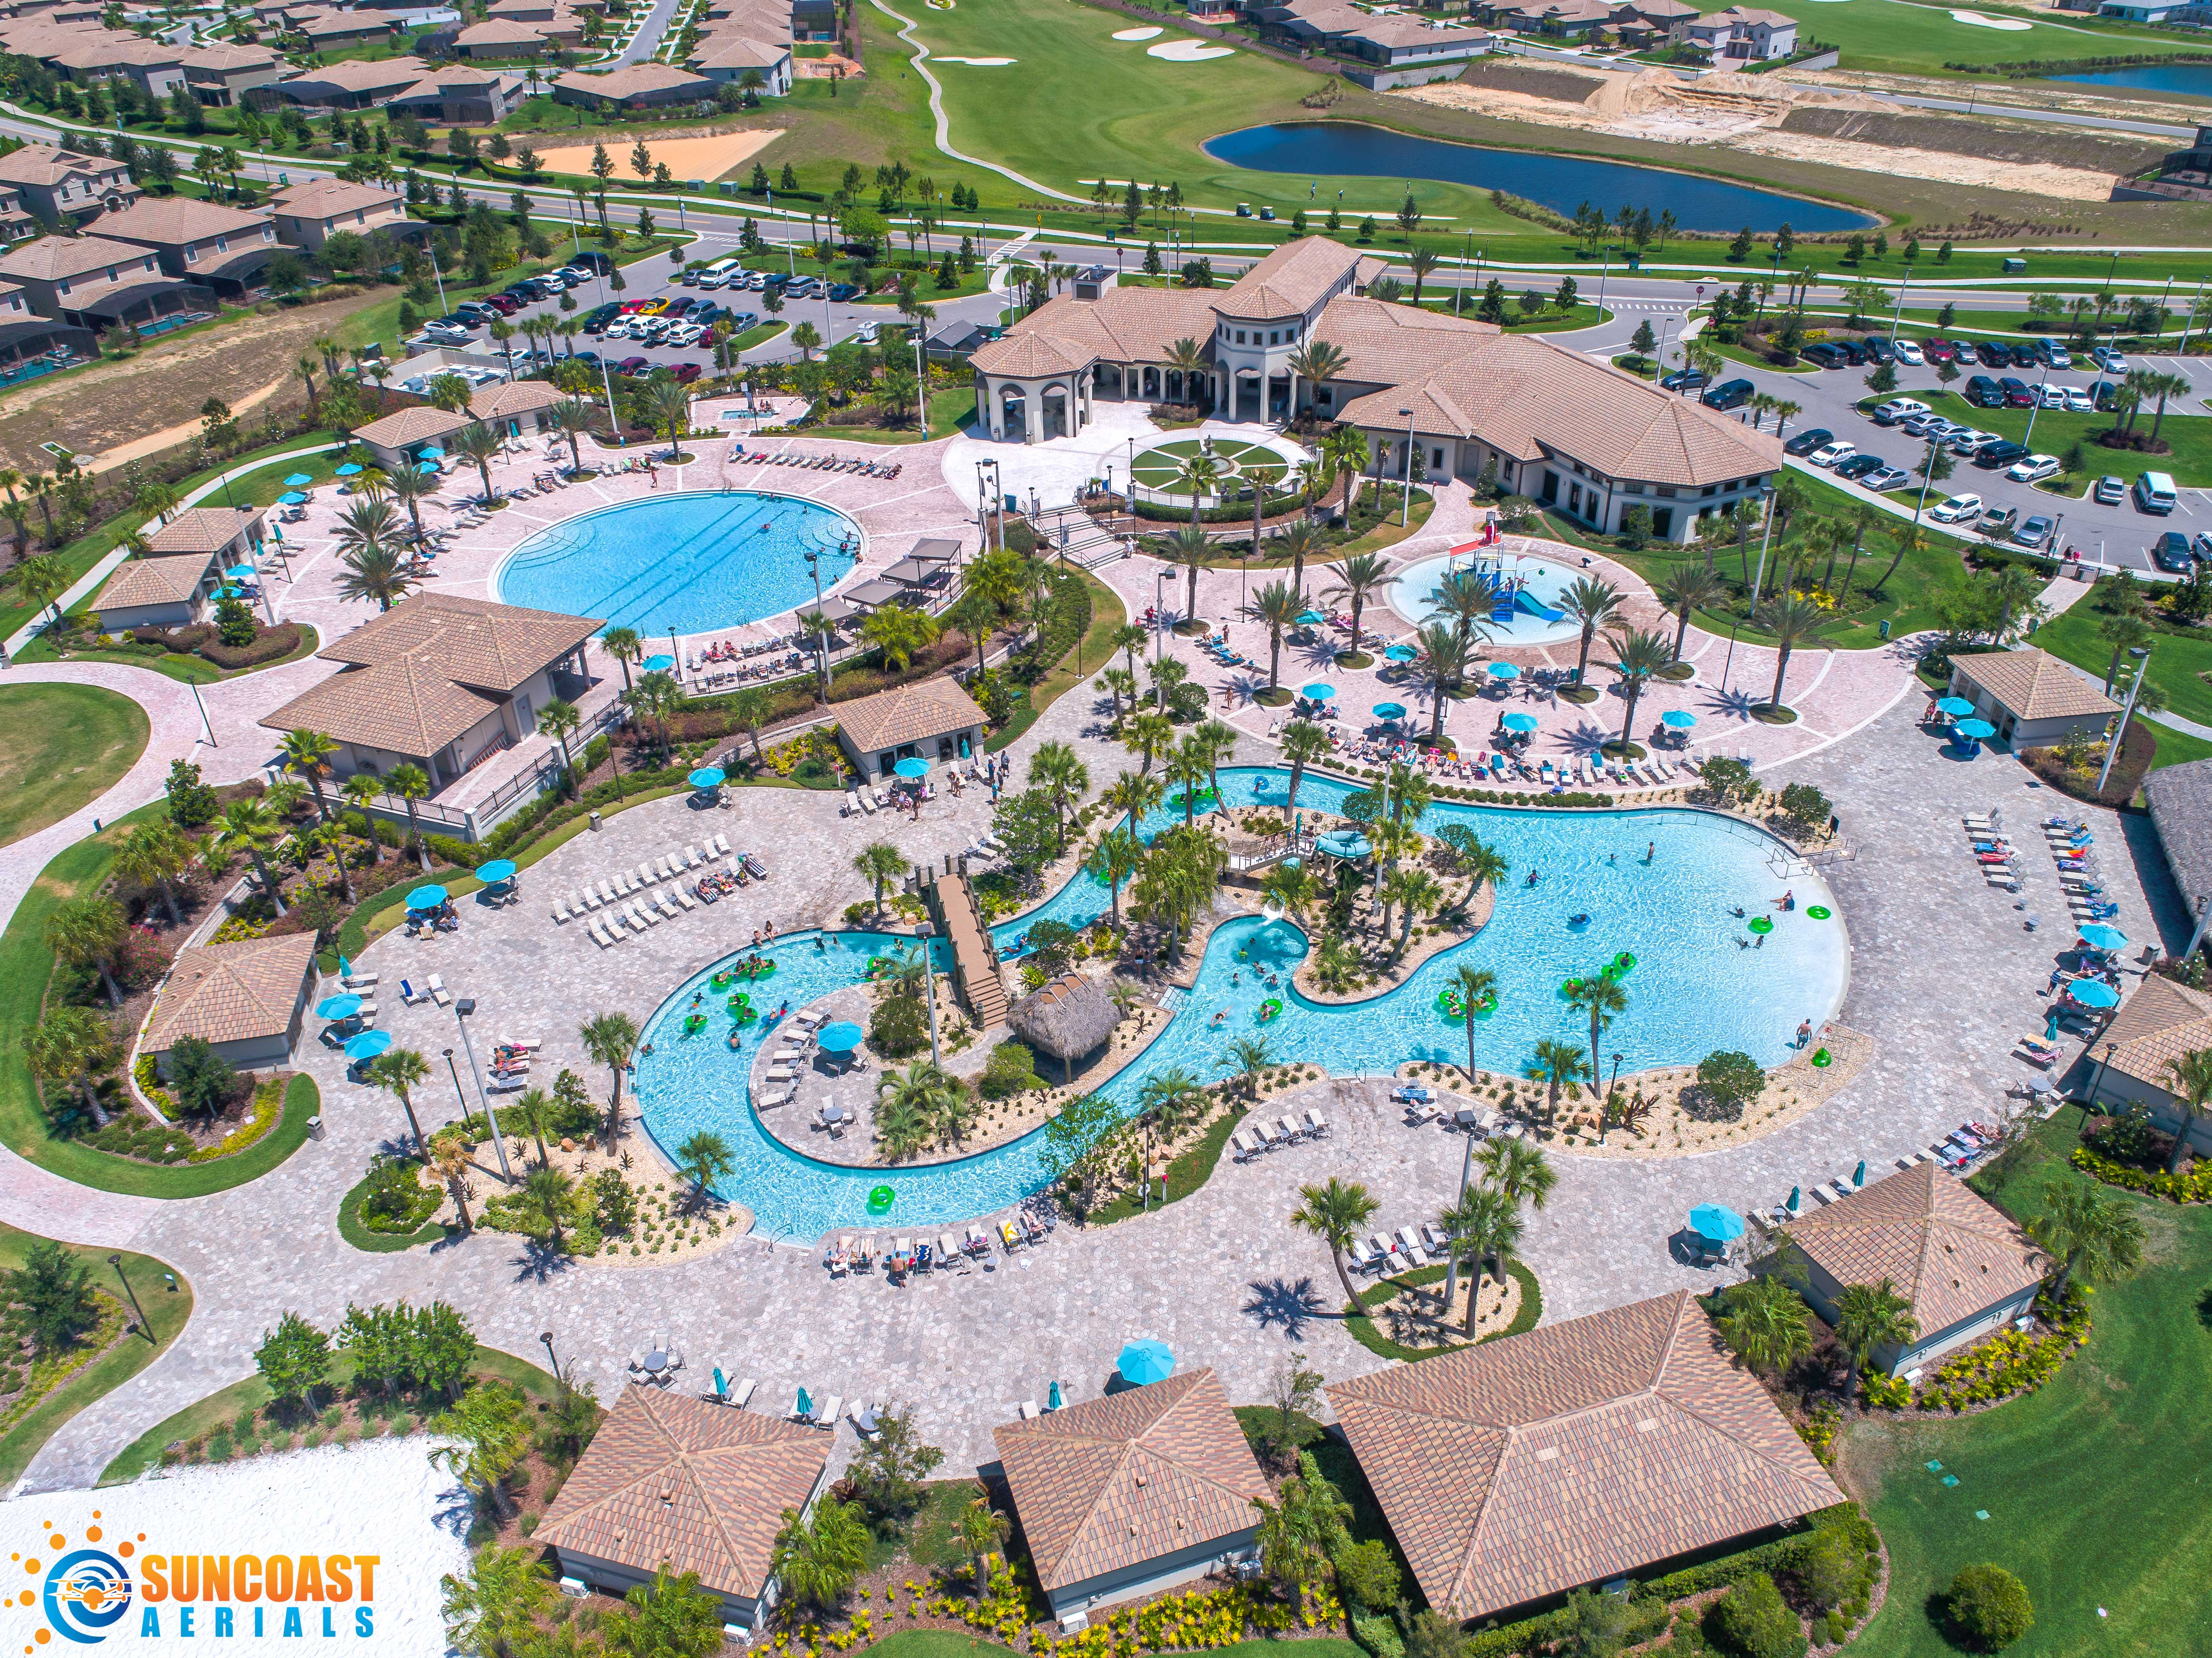 Professional Drone Services – Suncoast Aerials – Sarasota, FL